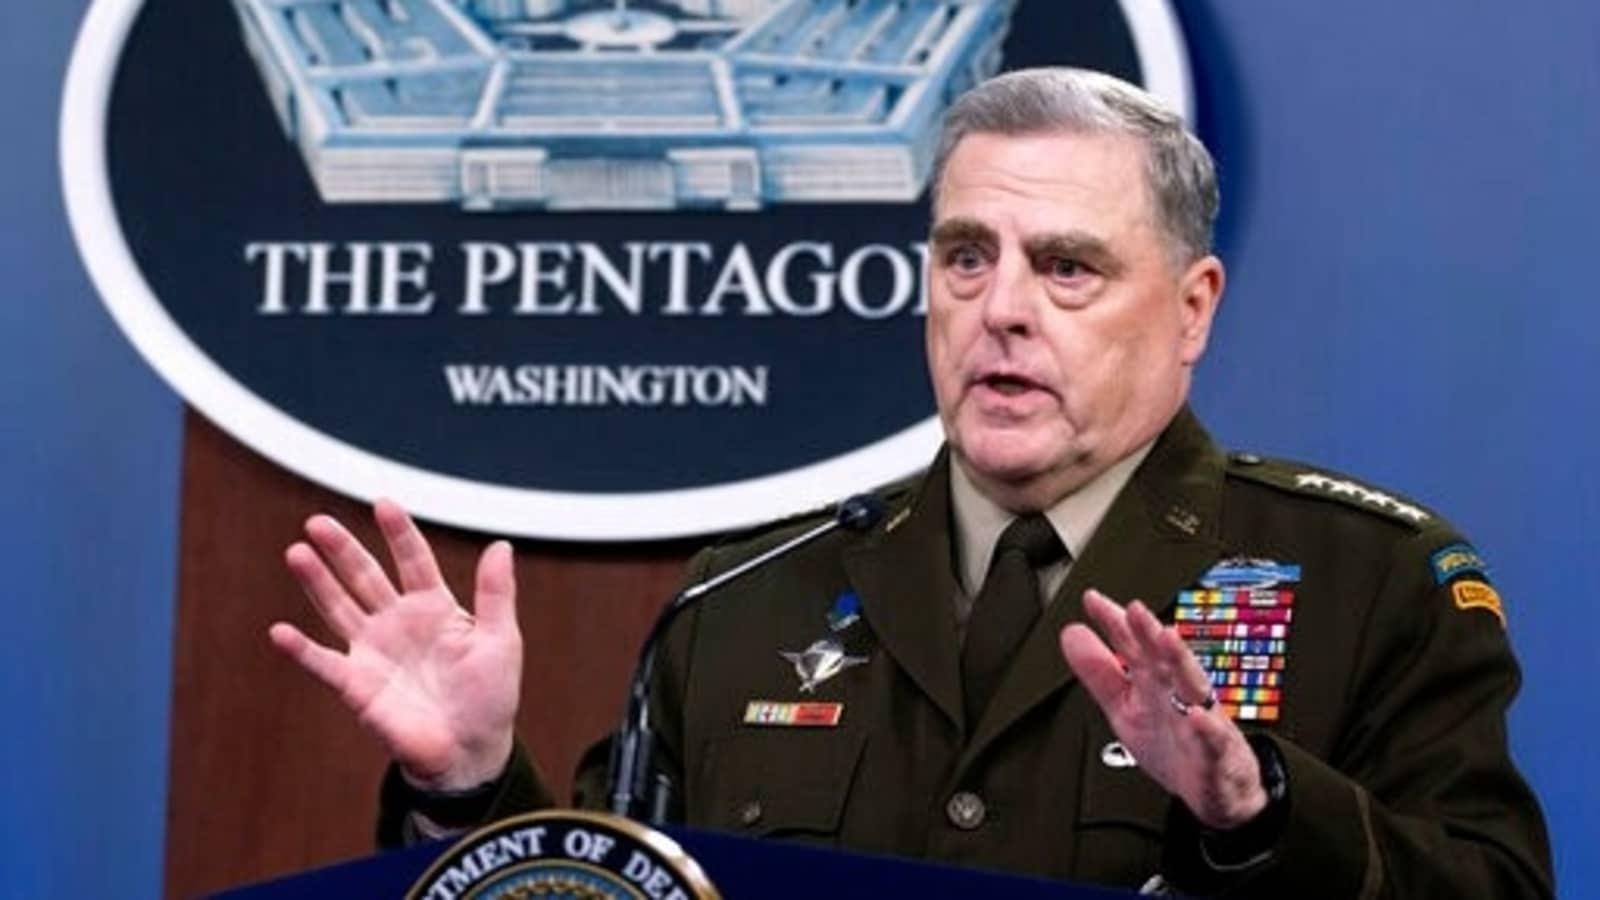 Taliban seem to have 'strategic momentum' in Afghanistan: top US general